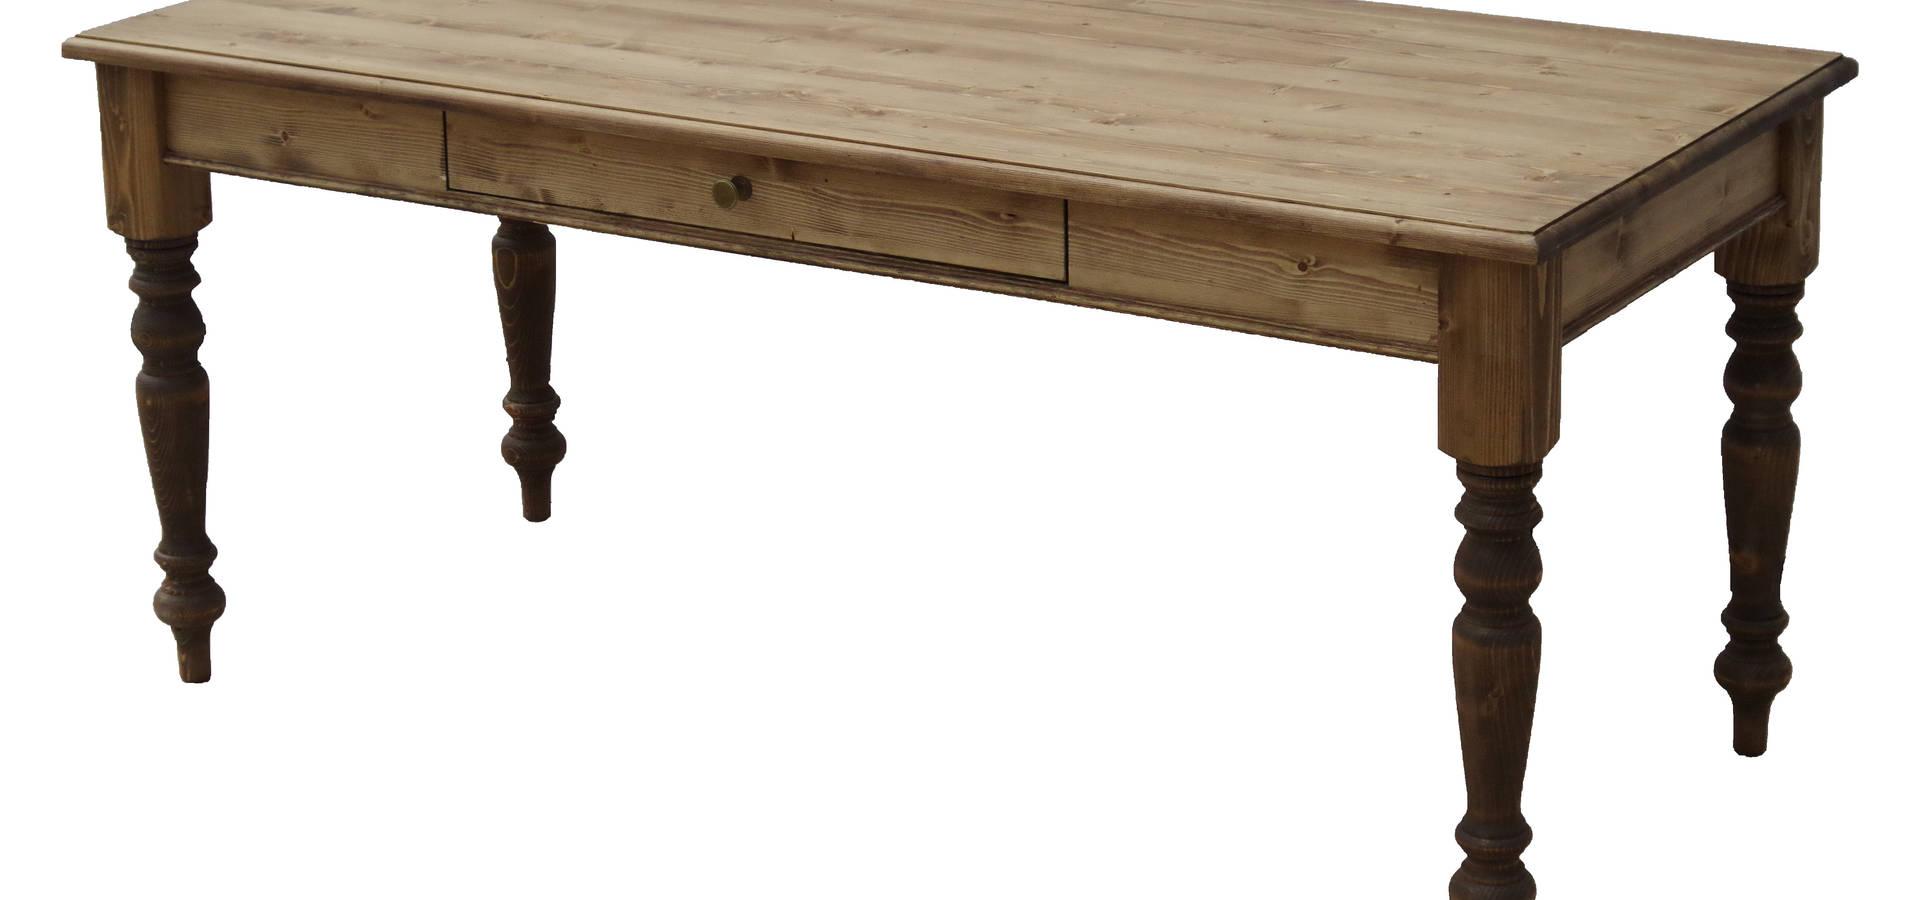 tischmanufaktur edelrift tischler in hamburg homify. Black Bedroom Furniture Sets. Home Design Ideas